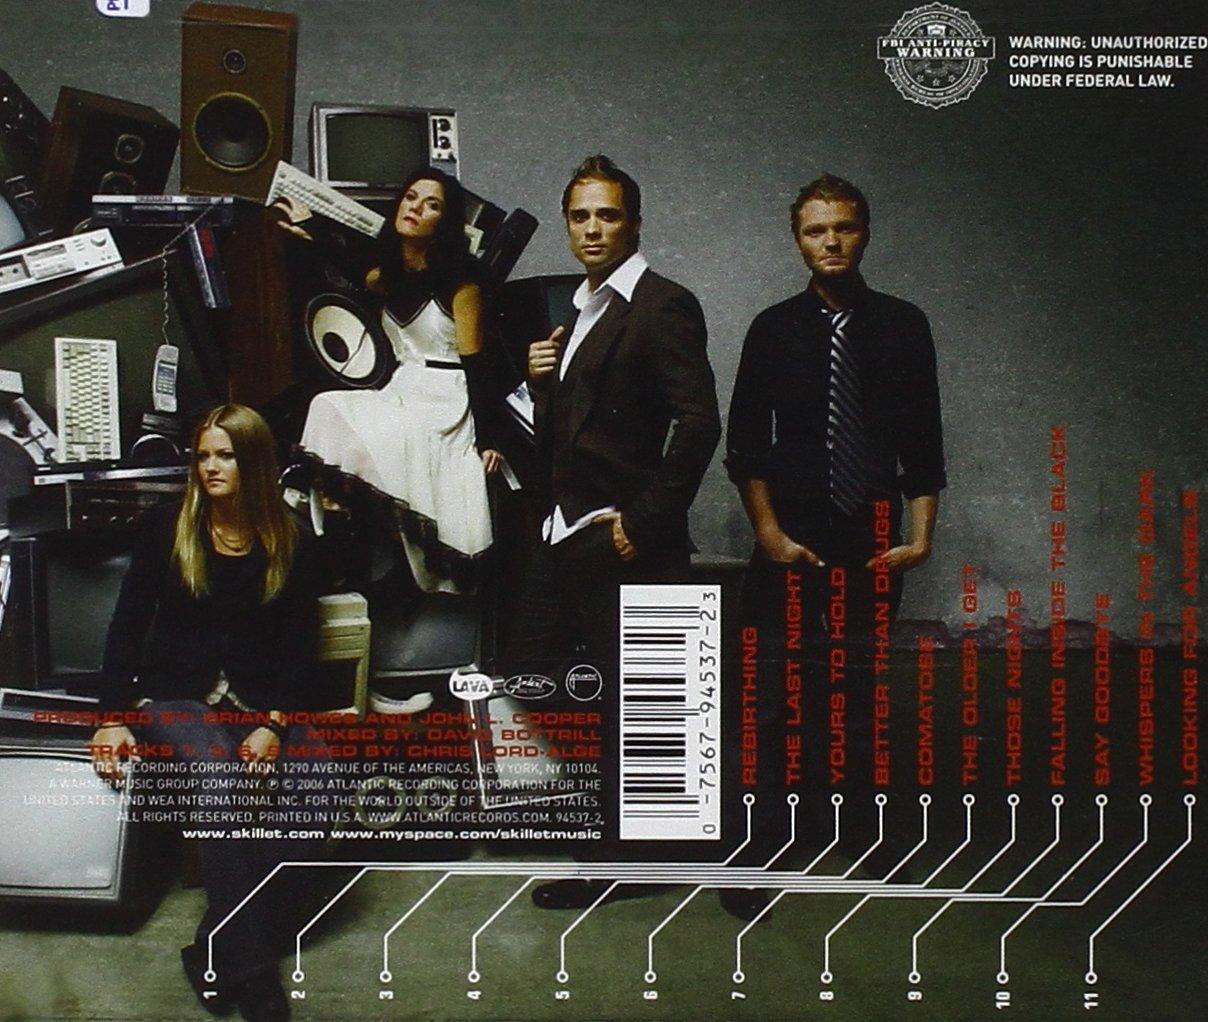 skillet concert poster. skillet concert poster